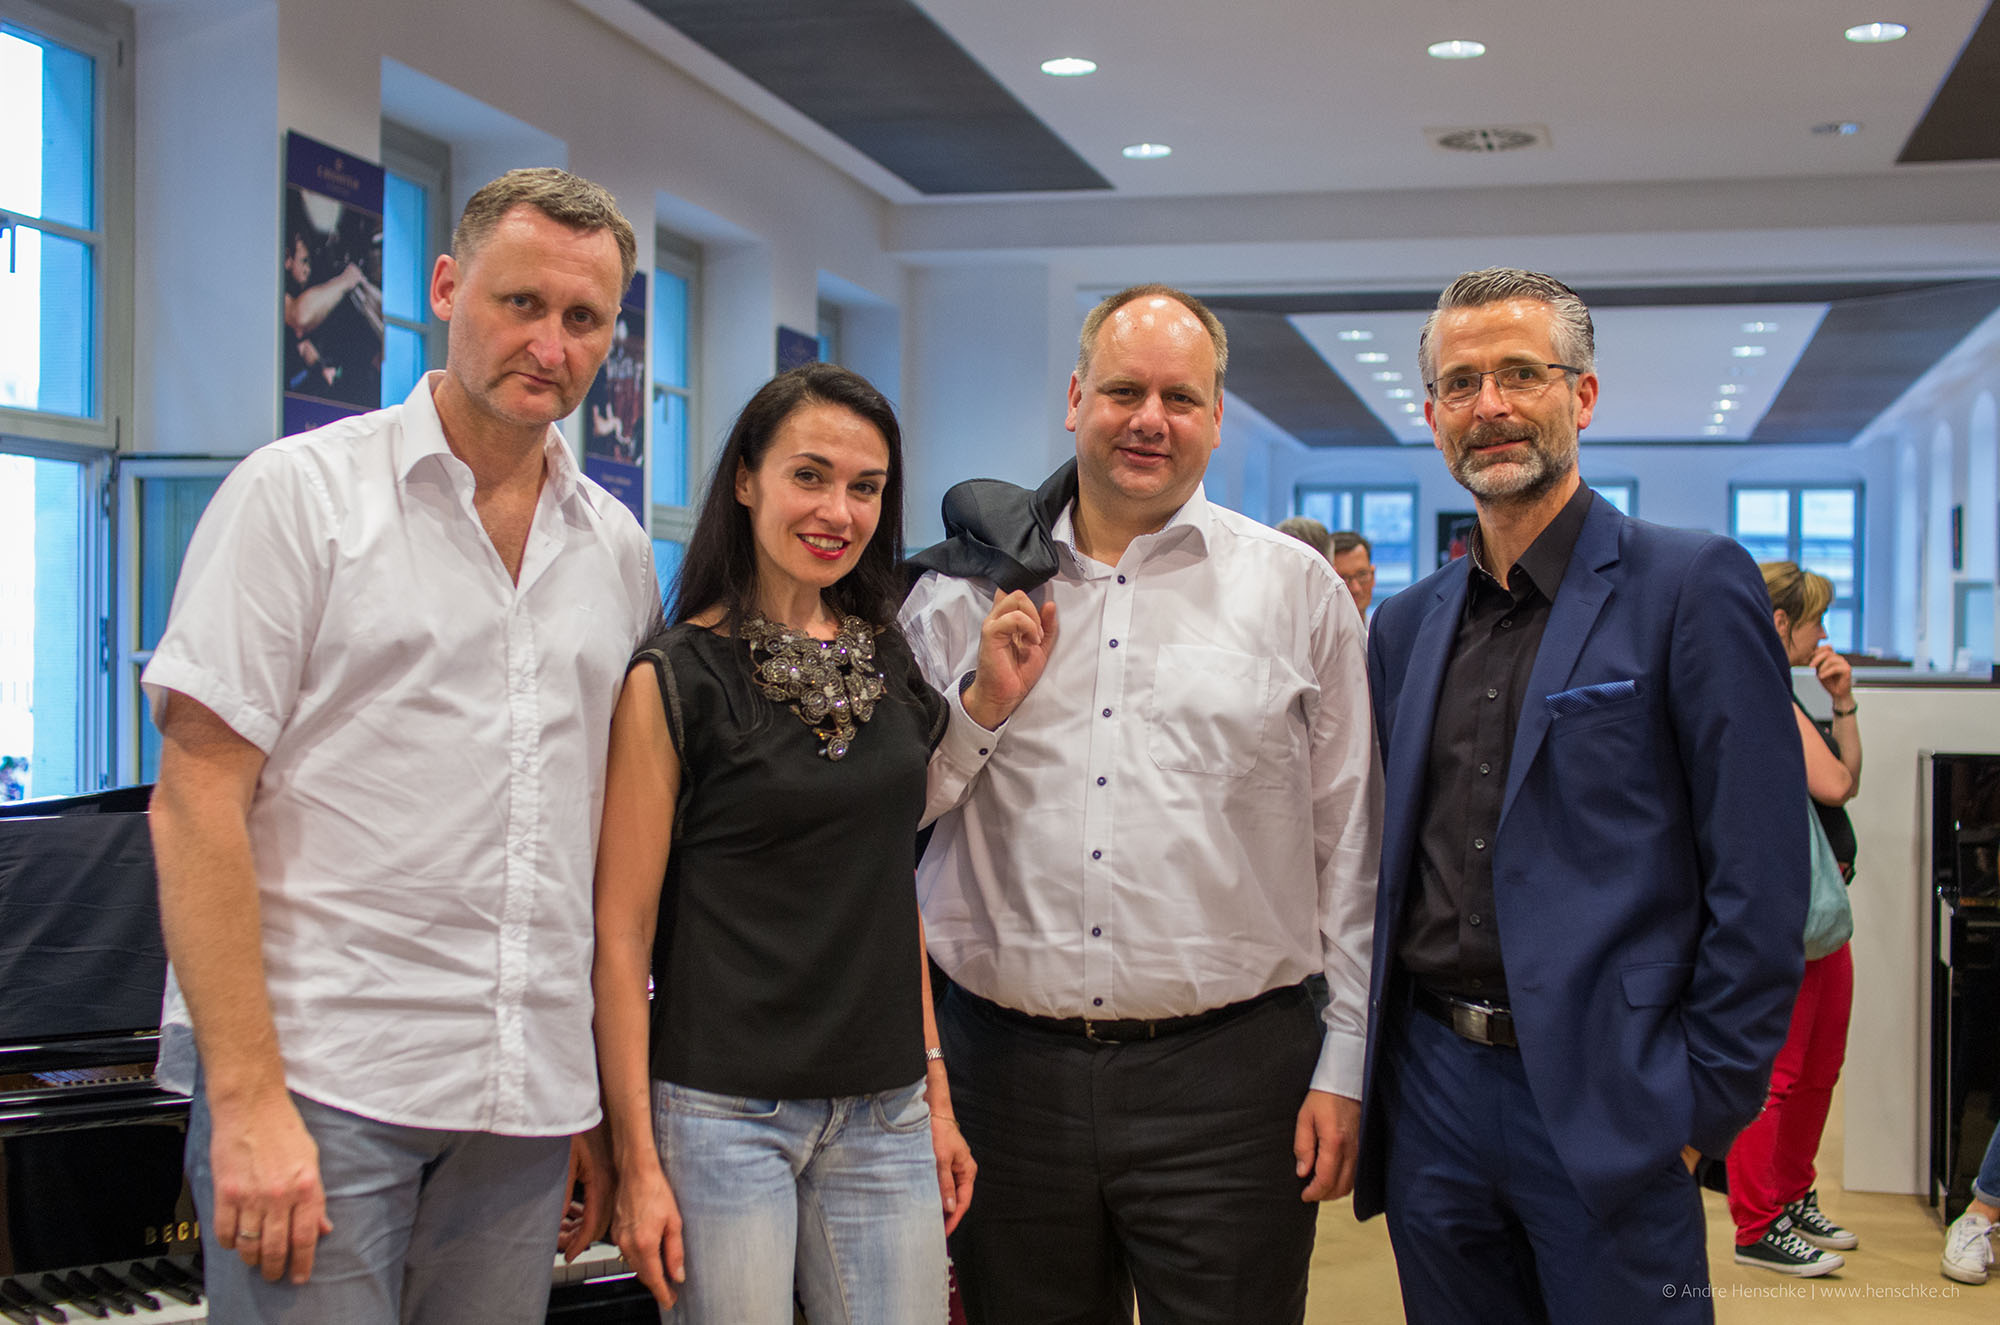 v.l.n.r. Dirk Kohl (Weltbuch), Lidia Valenta (Sängerin), Dirk Hilbert (OB), Dirk Riedel (ICM Bank)